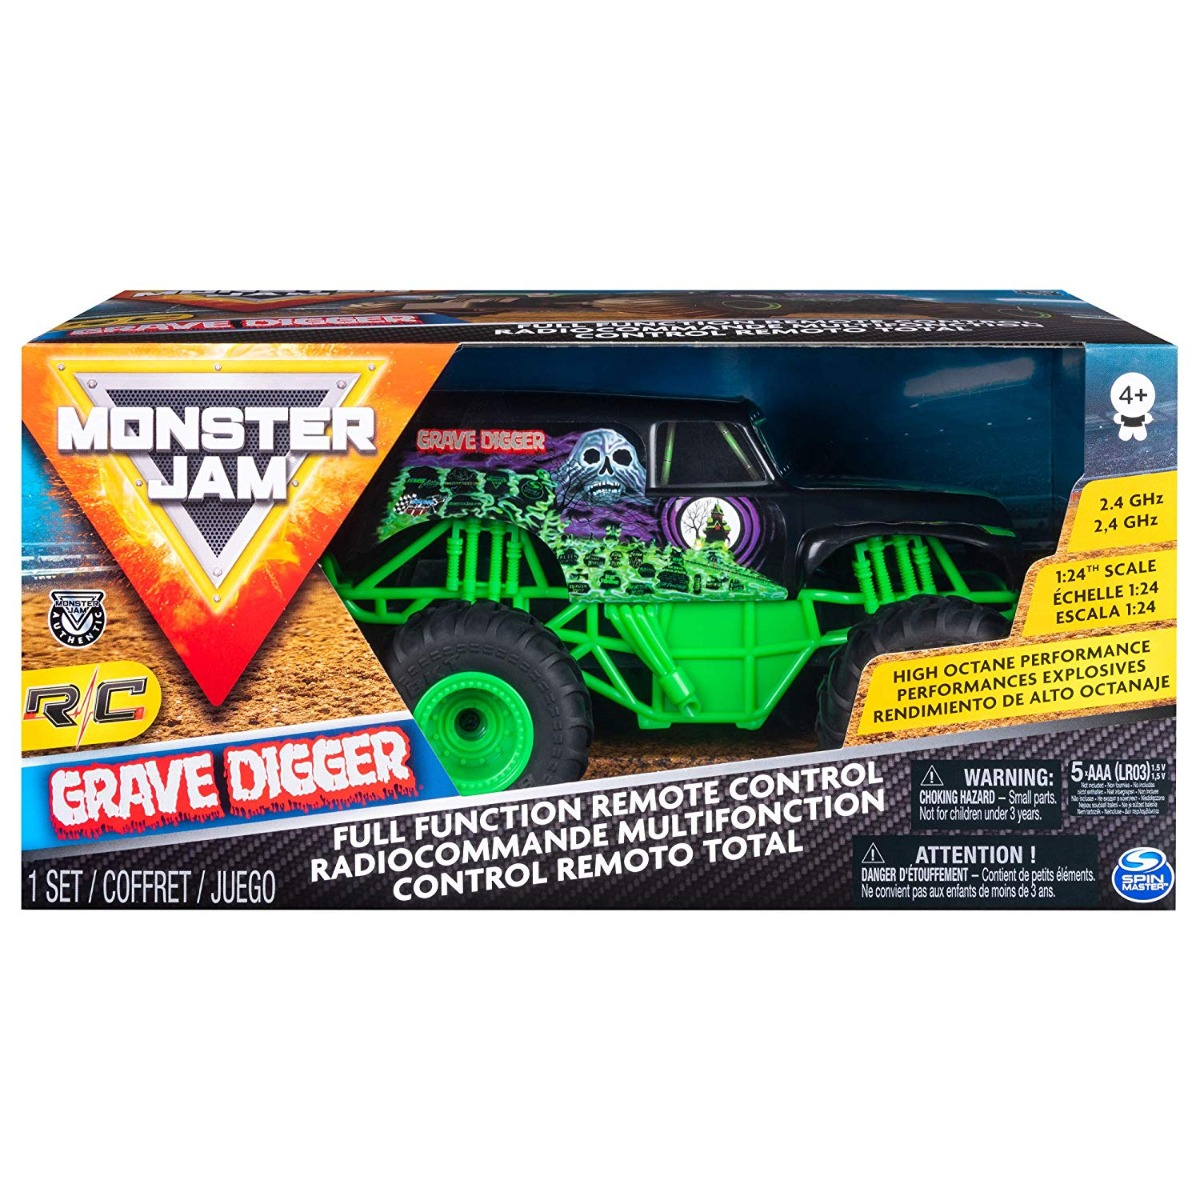 Masinuta cu telecomanda Monster Jam, Grave Digger, 1:24